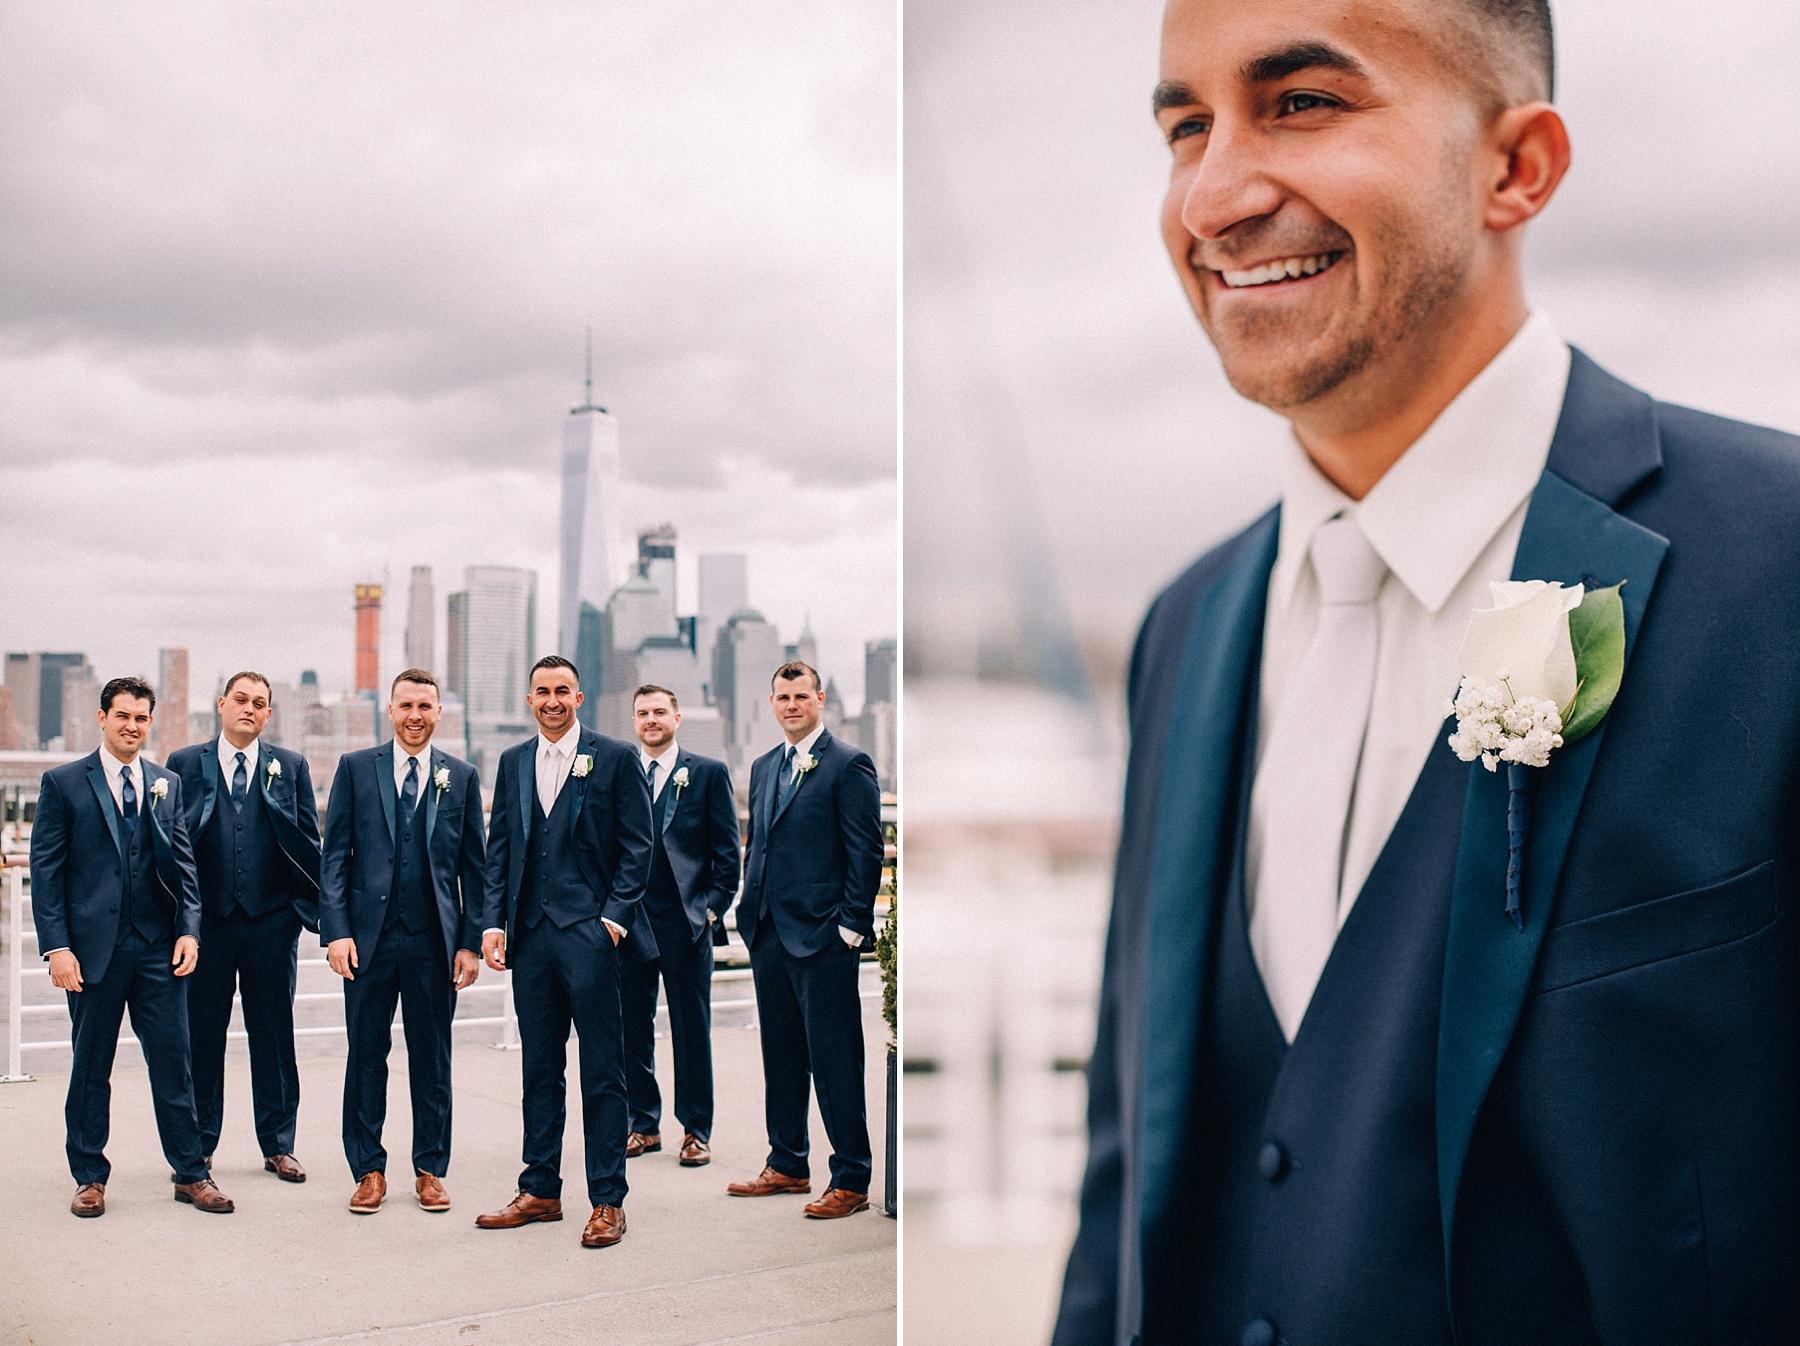 jersey-city-nj-wedding-photographer-top_0009.jpg